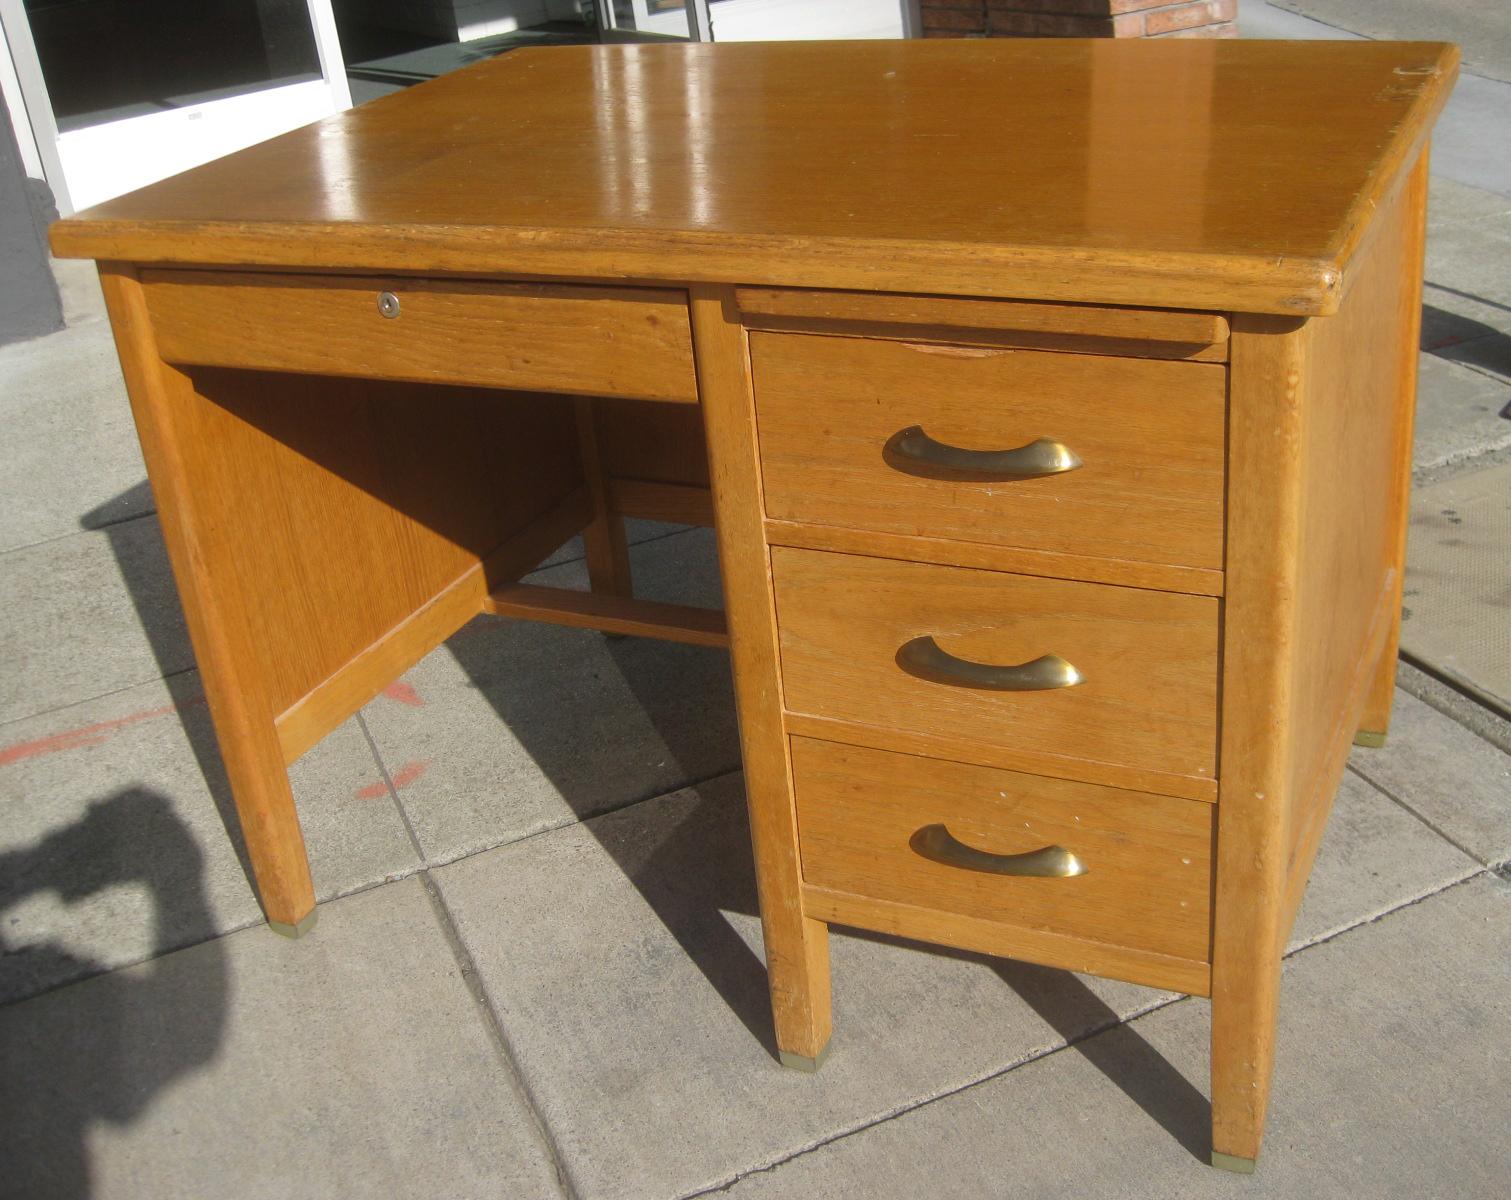 Uhuru furniture collectibles sold small oak teacher s